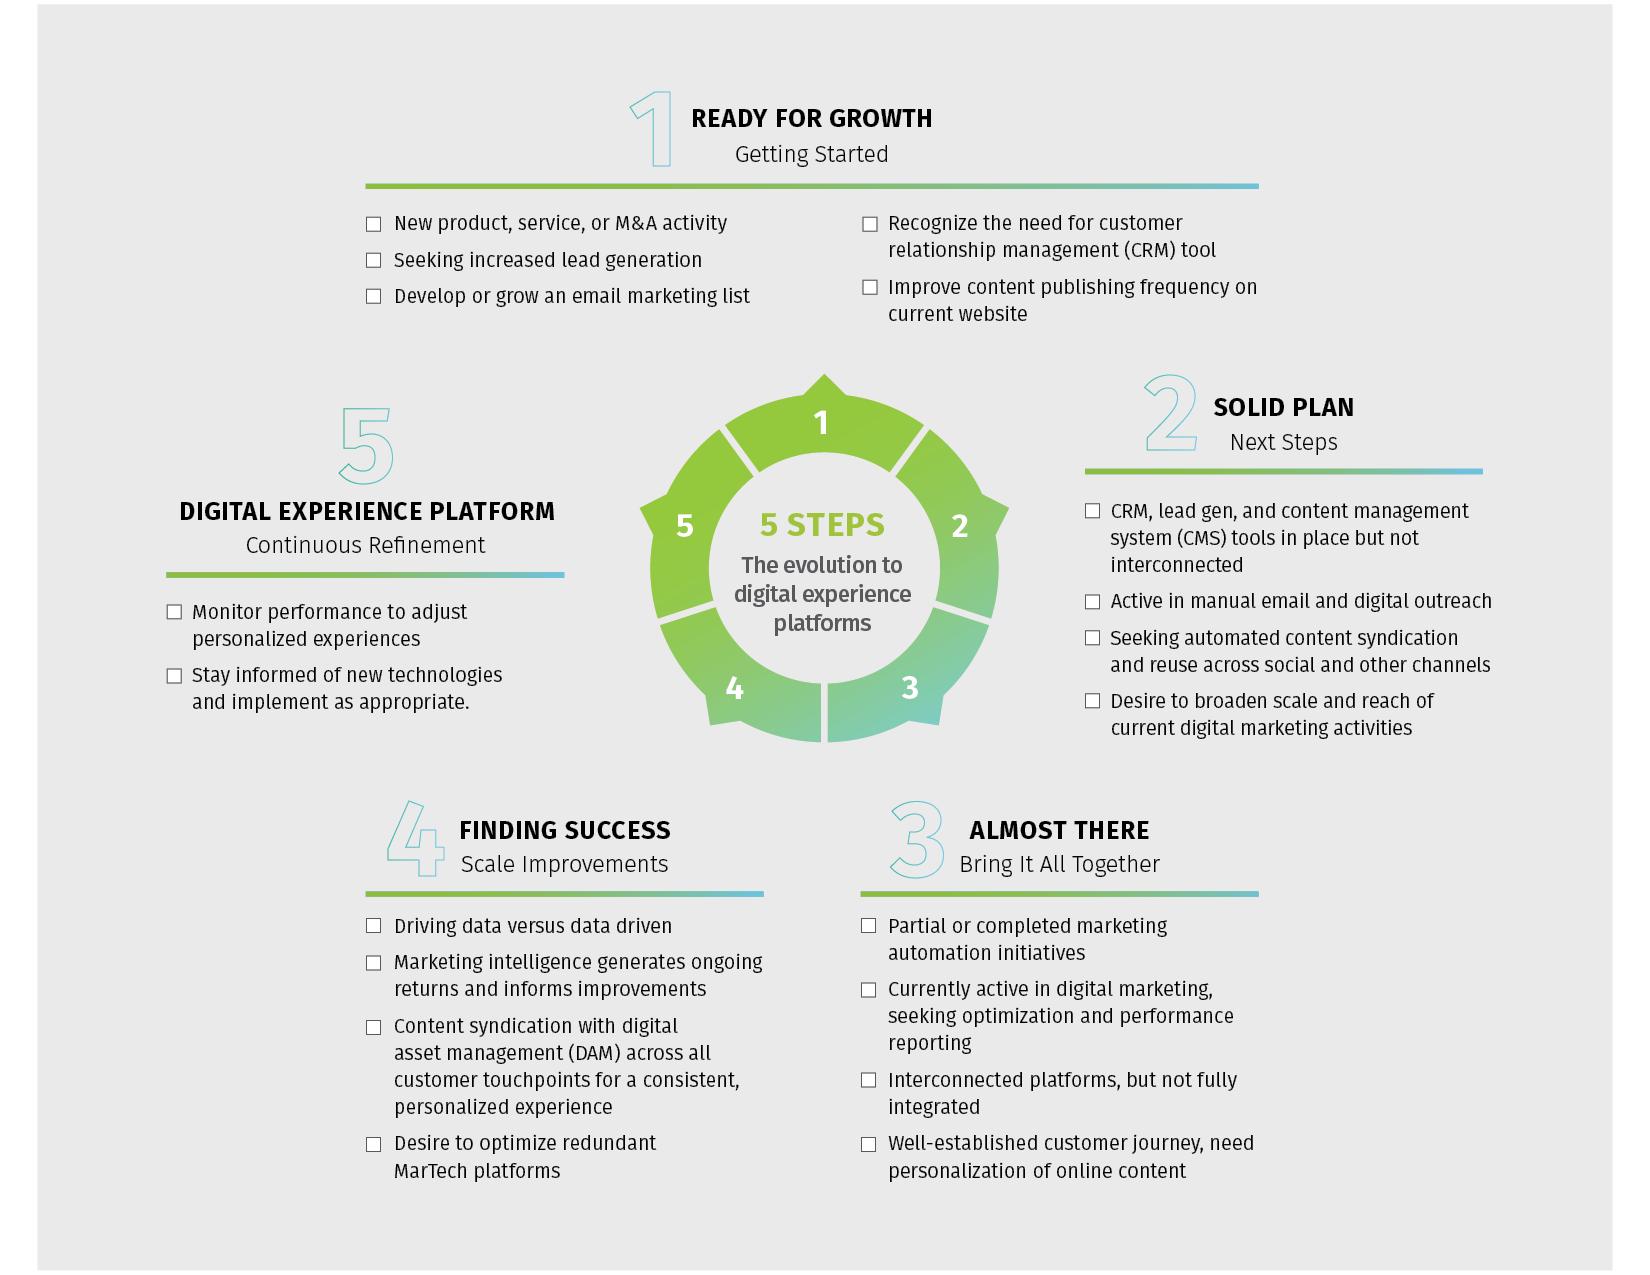 5 steps to digital experience platform